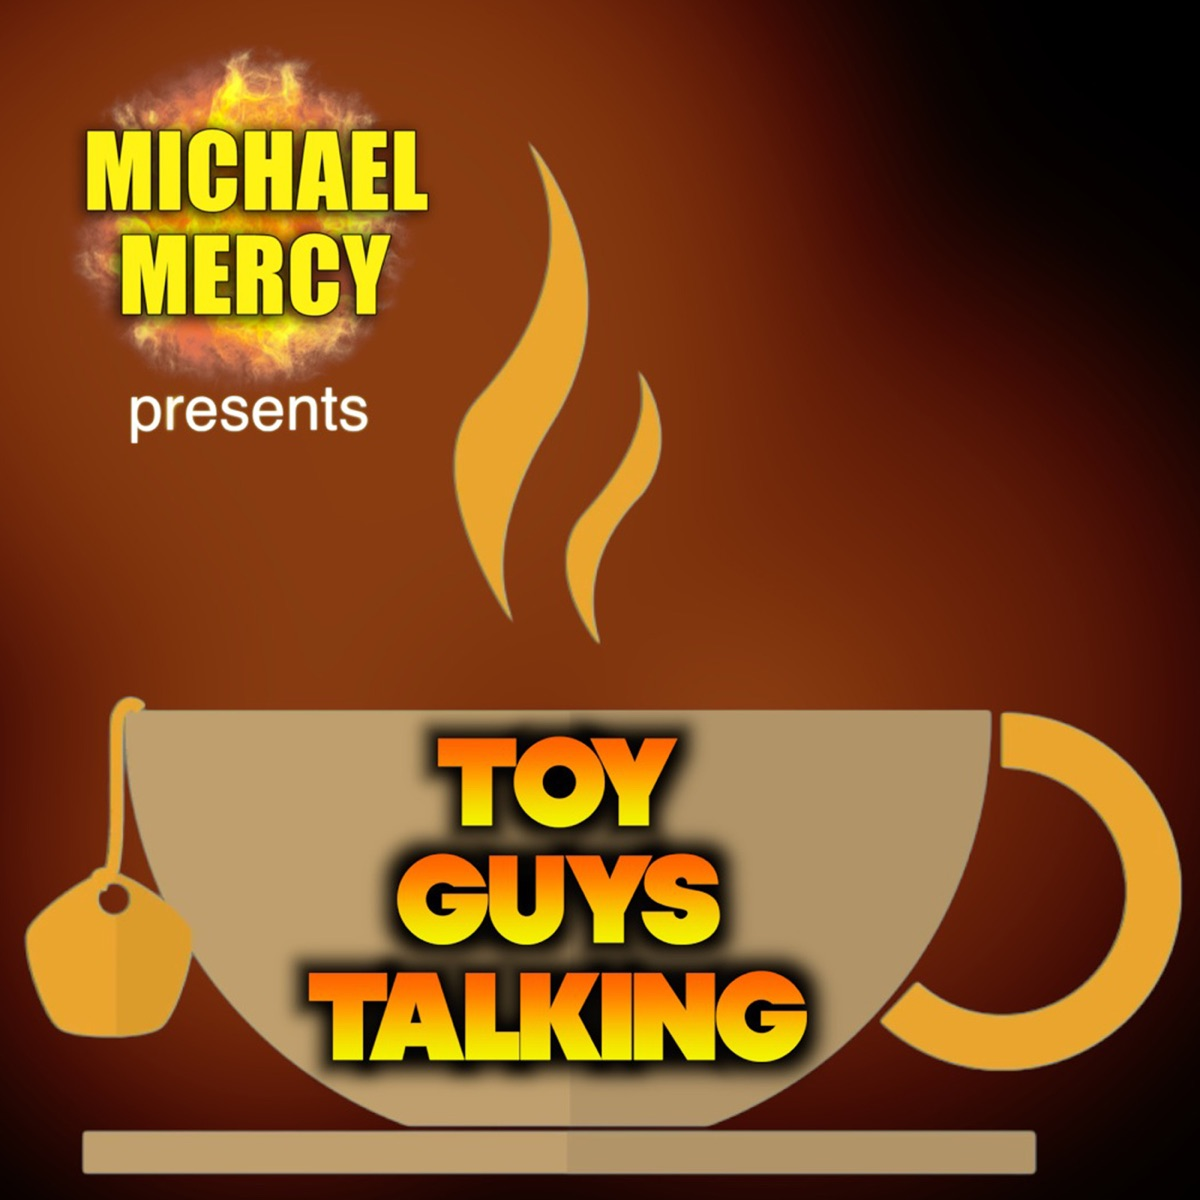 Michael Mercy presents Toy Guys Talking